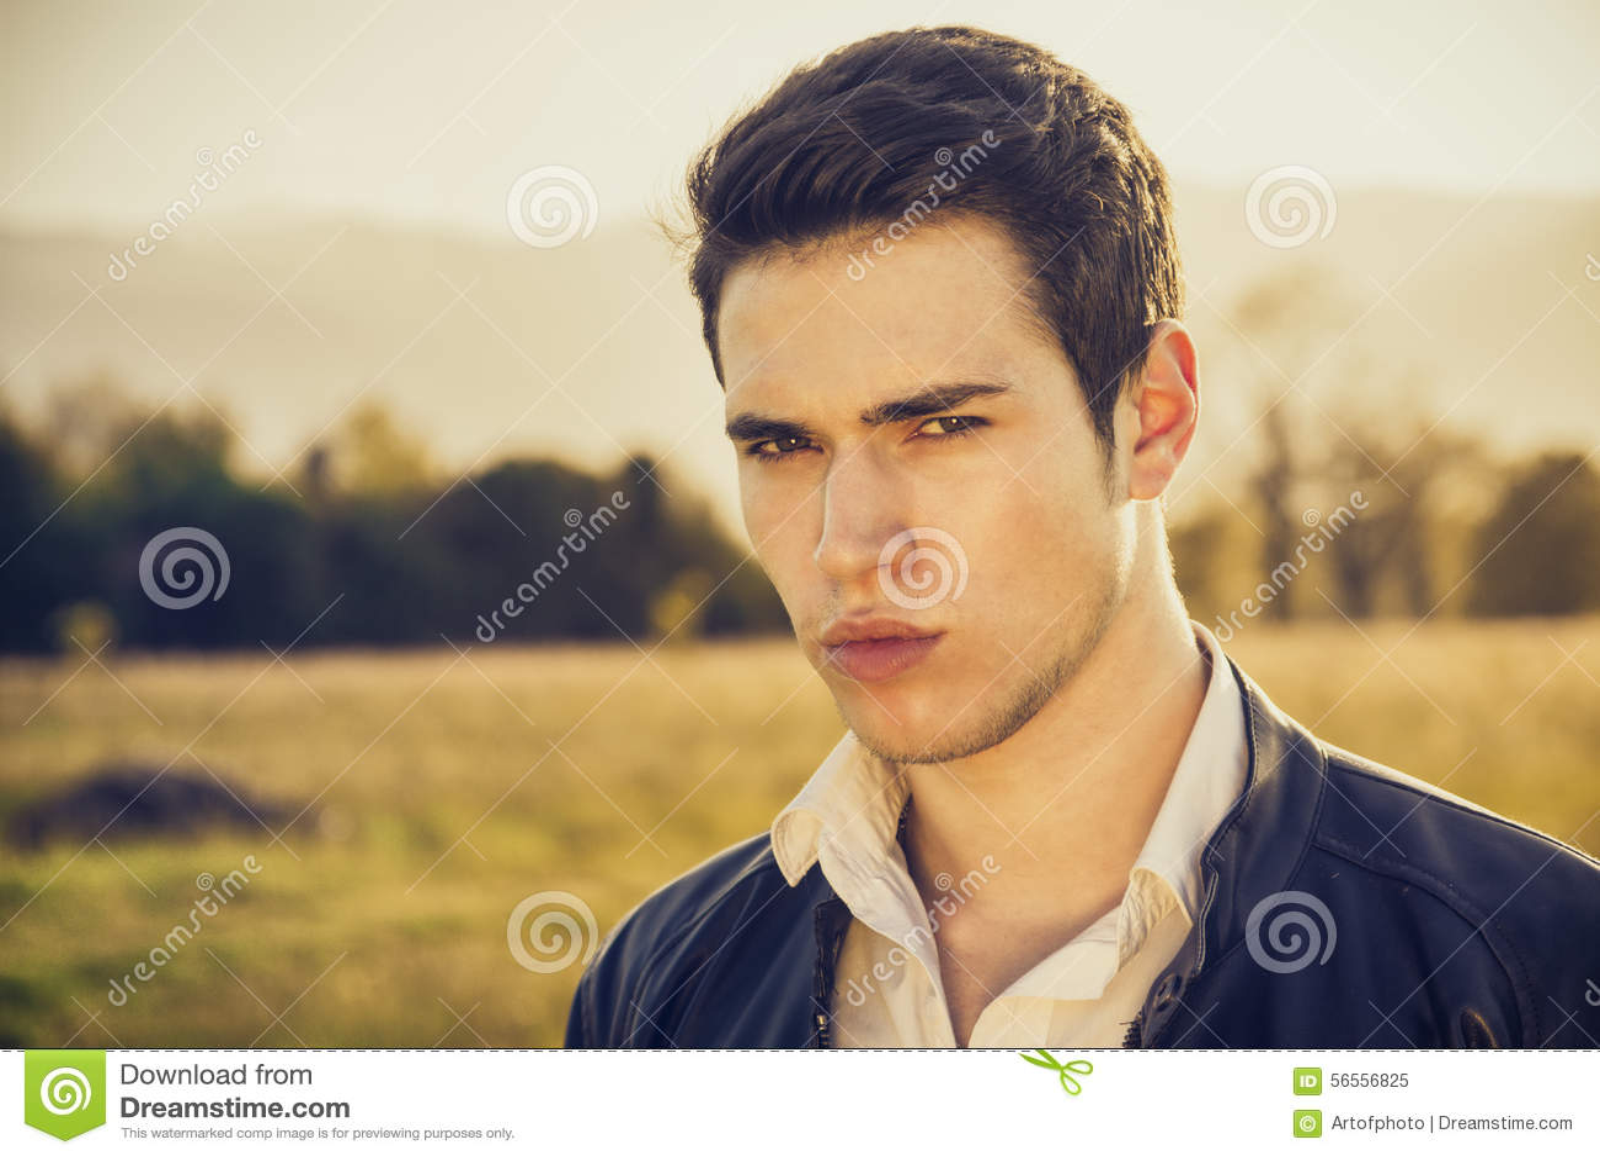 Download Όμορφος νεαρός άνδρας στην επαρχία, μπροστά από Στοκ Εικόνα - εικόνα από τύπος, χορτοτάπητας: 56556825